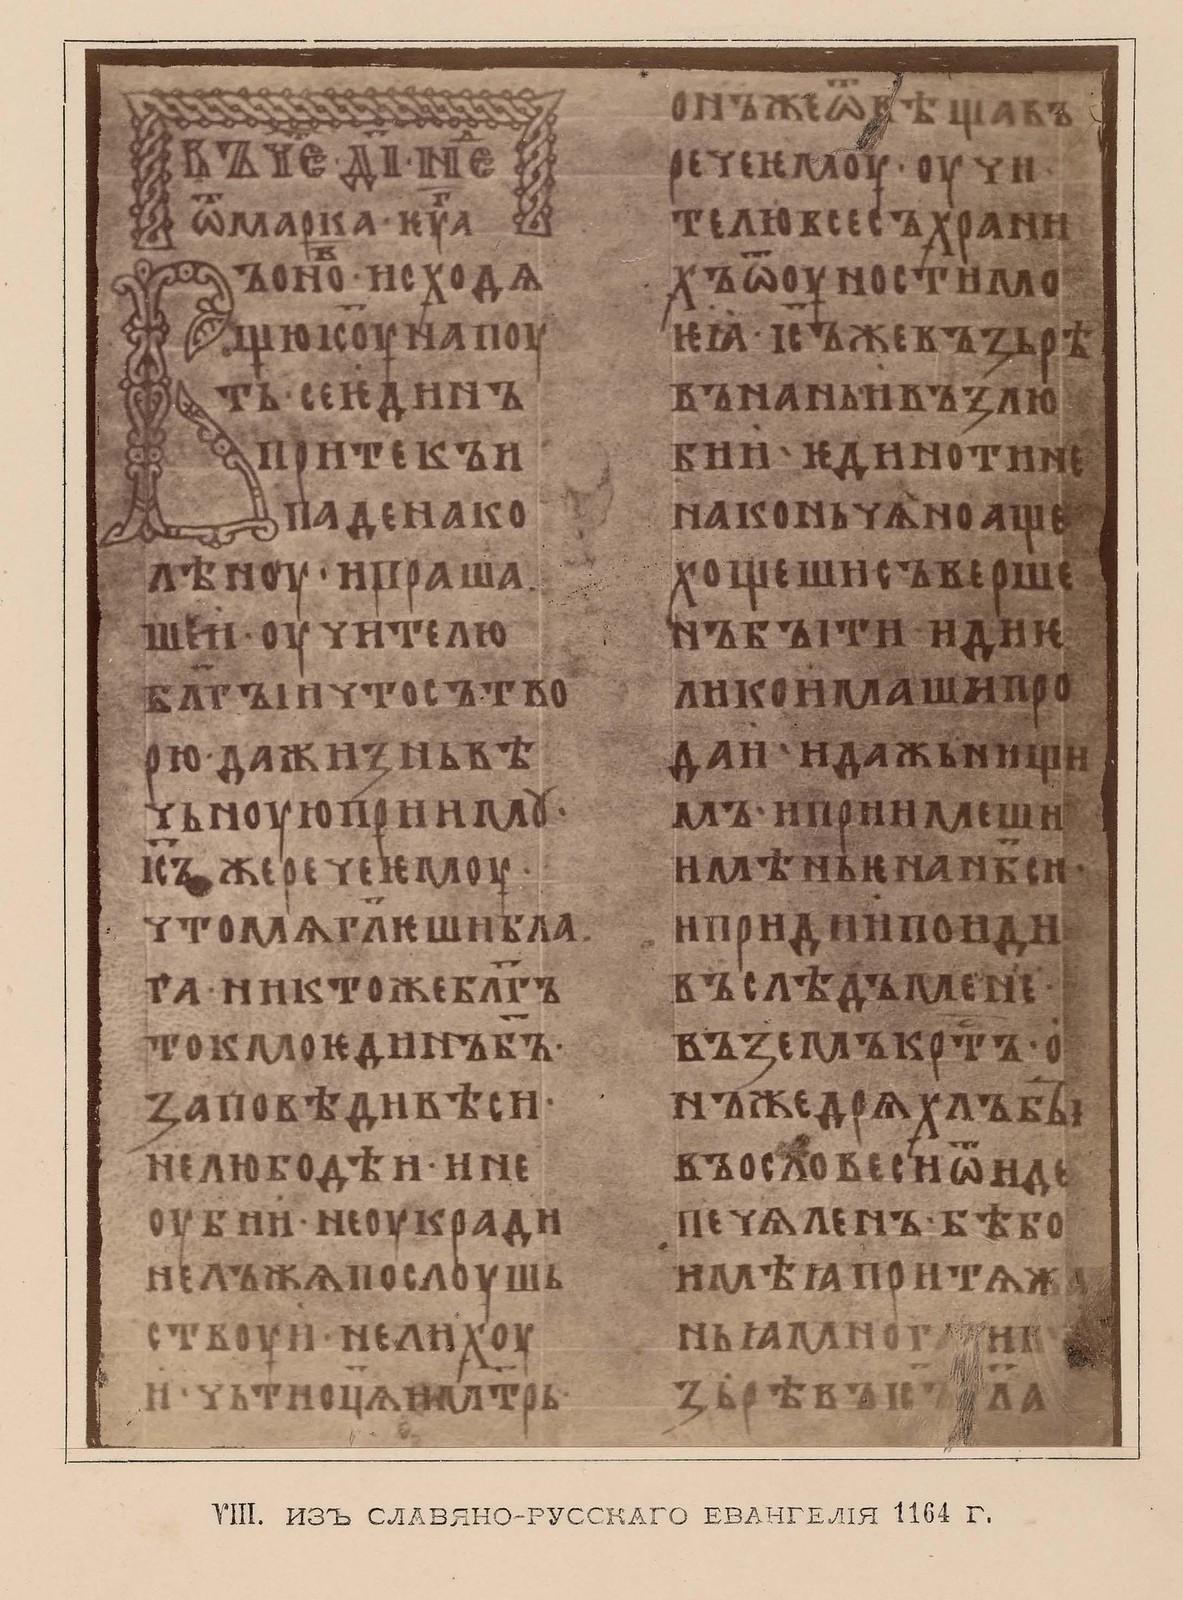 18. VII. Из Славяно-русского Евангелия 1092 г.